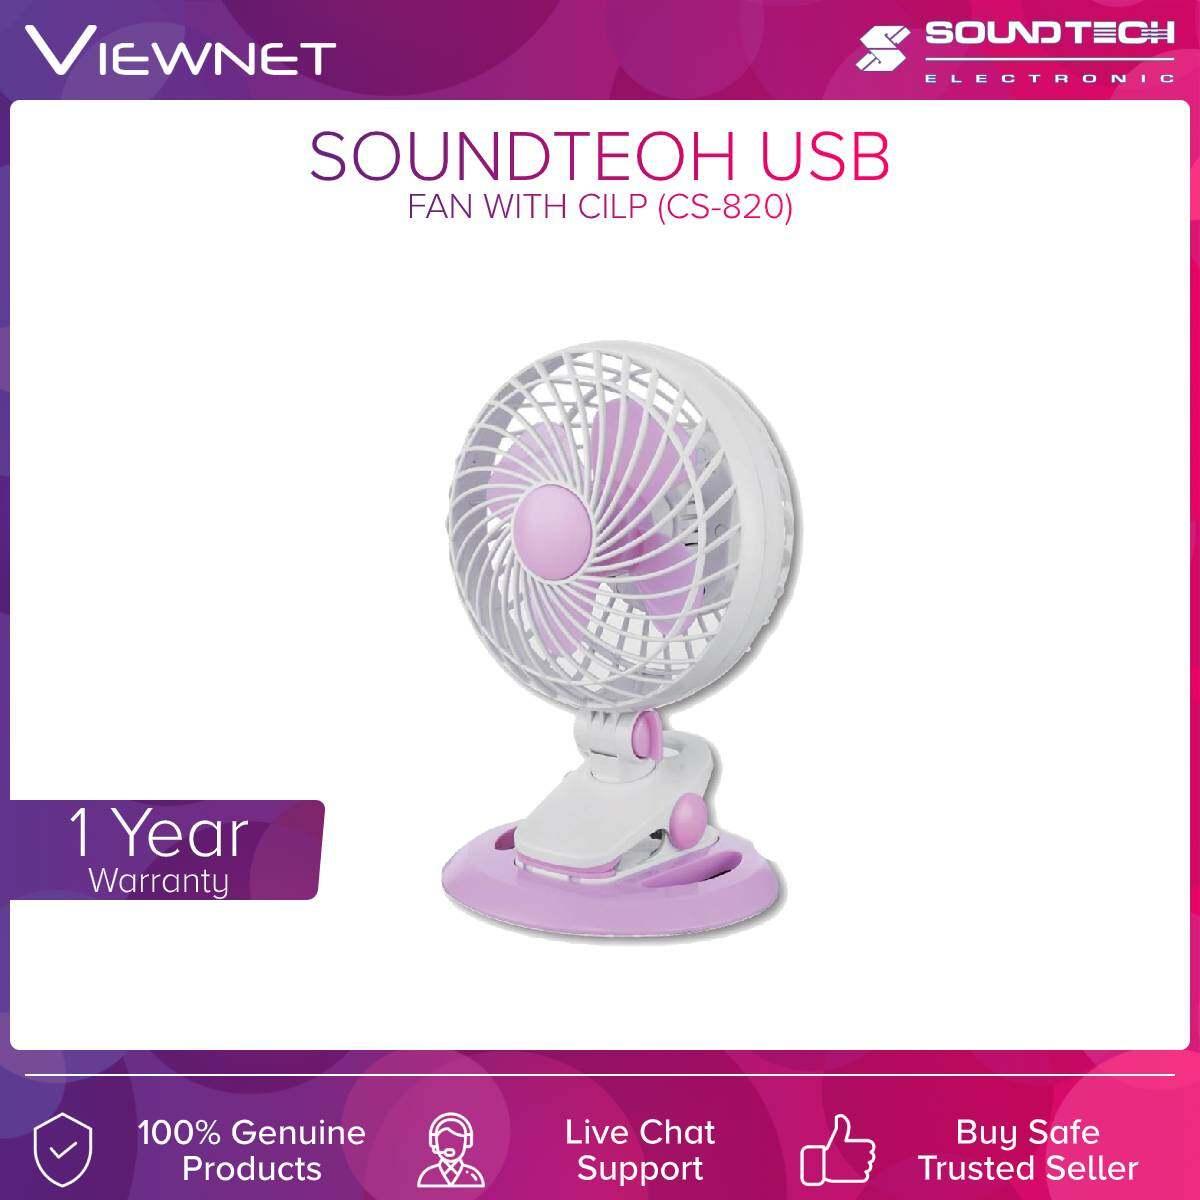 Soundteoh (CS-820) Usb fan With Clip